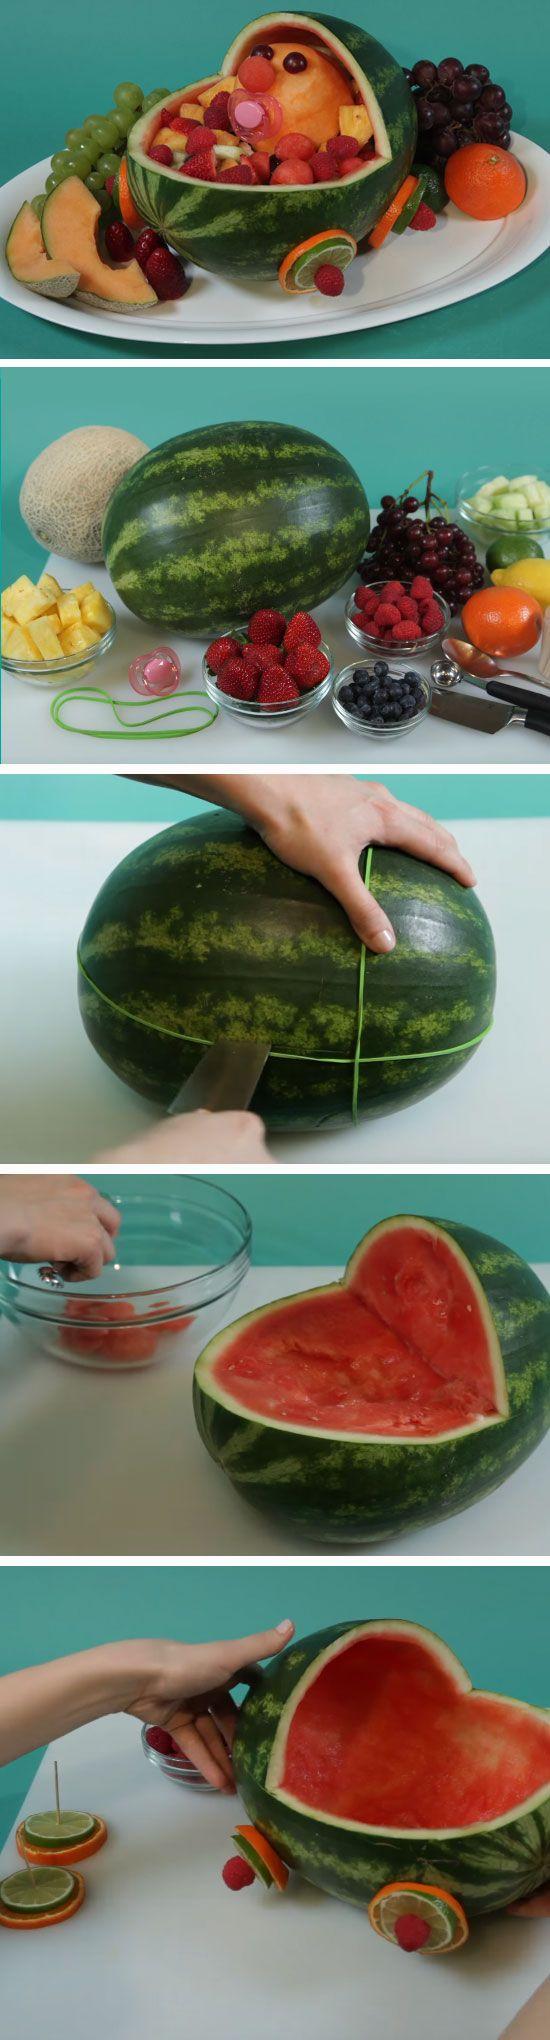 Stroller Fresh Fruit Salad | DIY Baby Shower Ideas for a Girl | Easy Birthday Party Ideas for Girls DIY